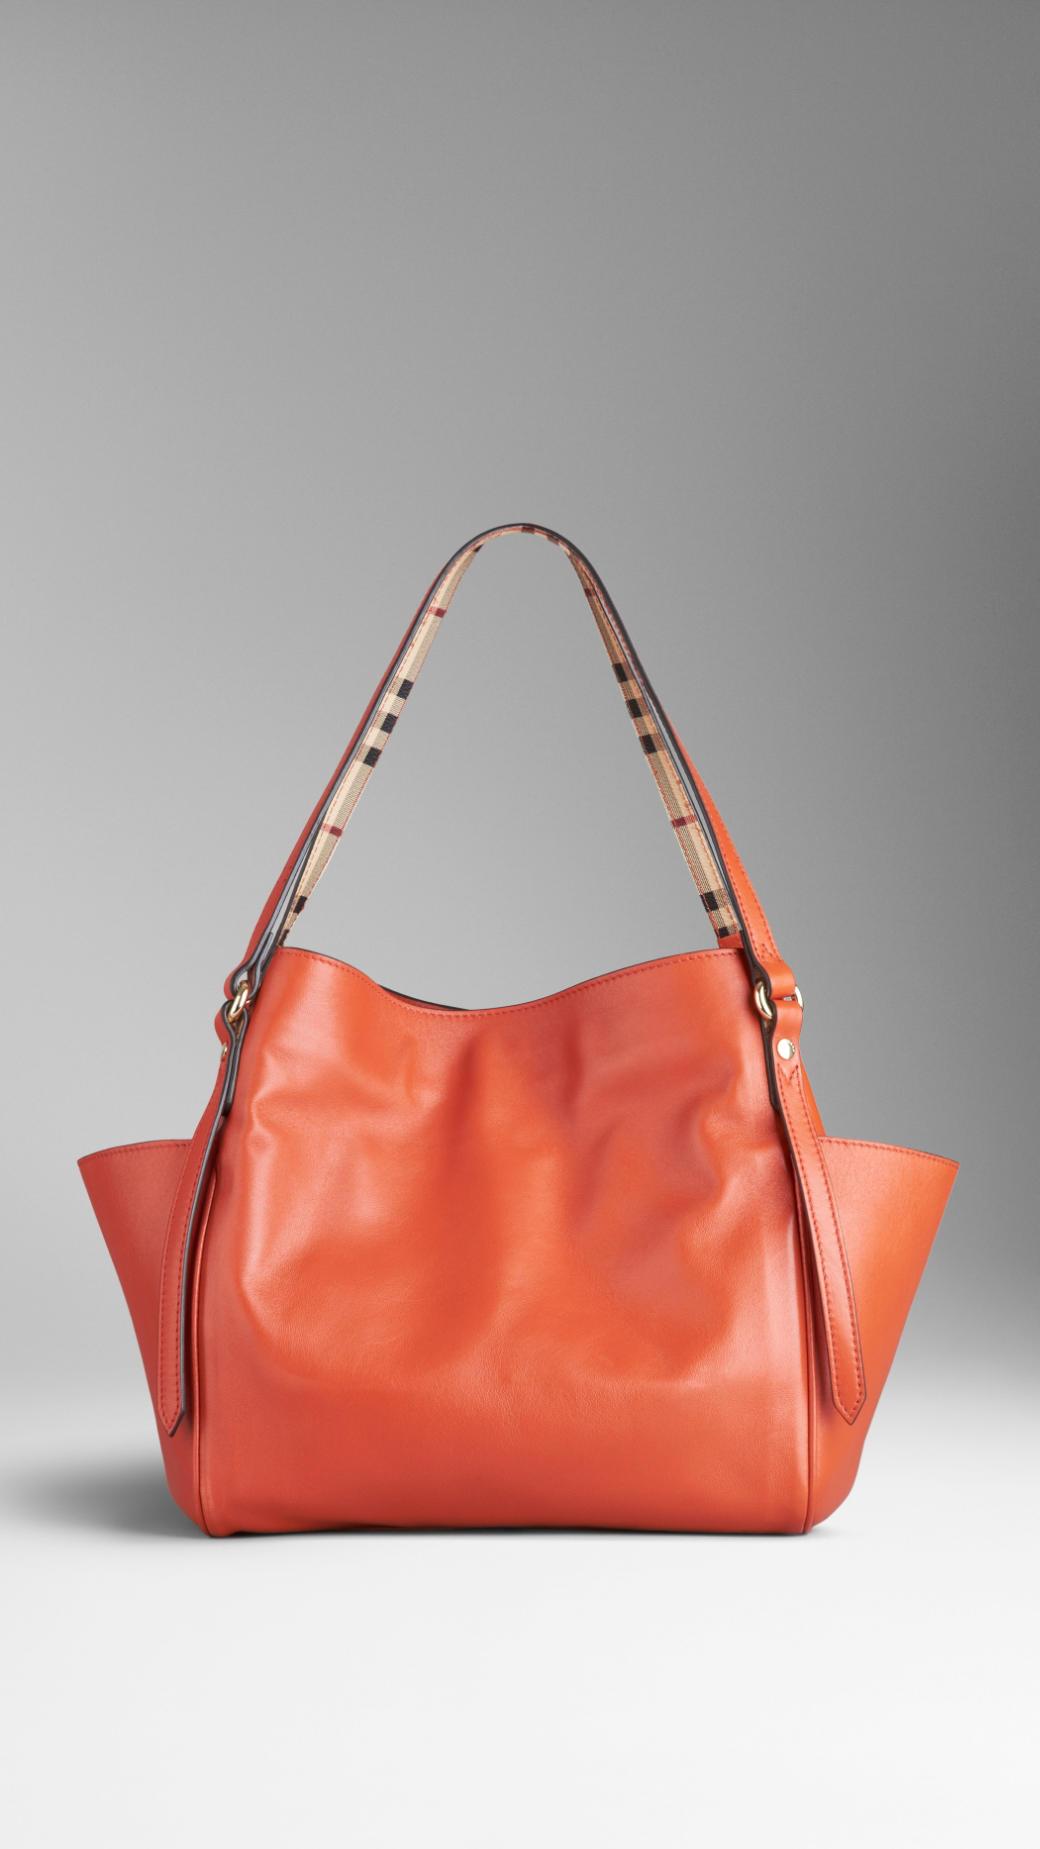 61c4cb6d66 Lyst - Burberry Small Nappa Leather Tote Bag in Orange